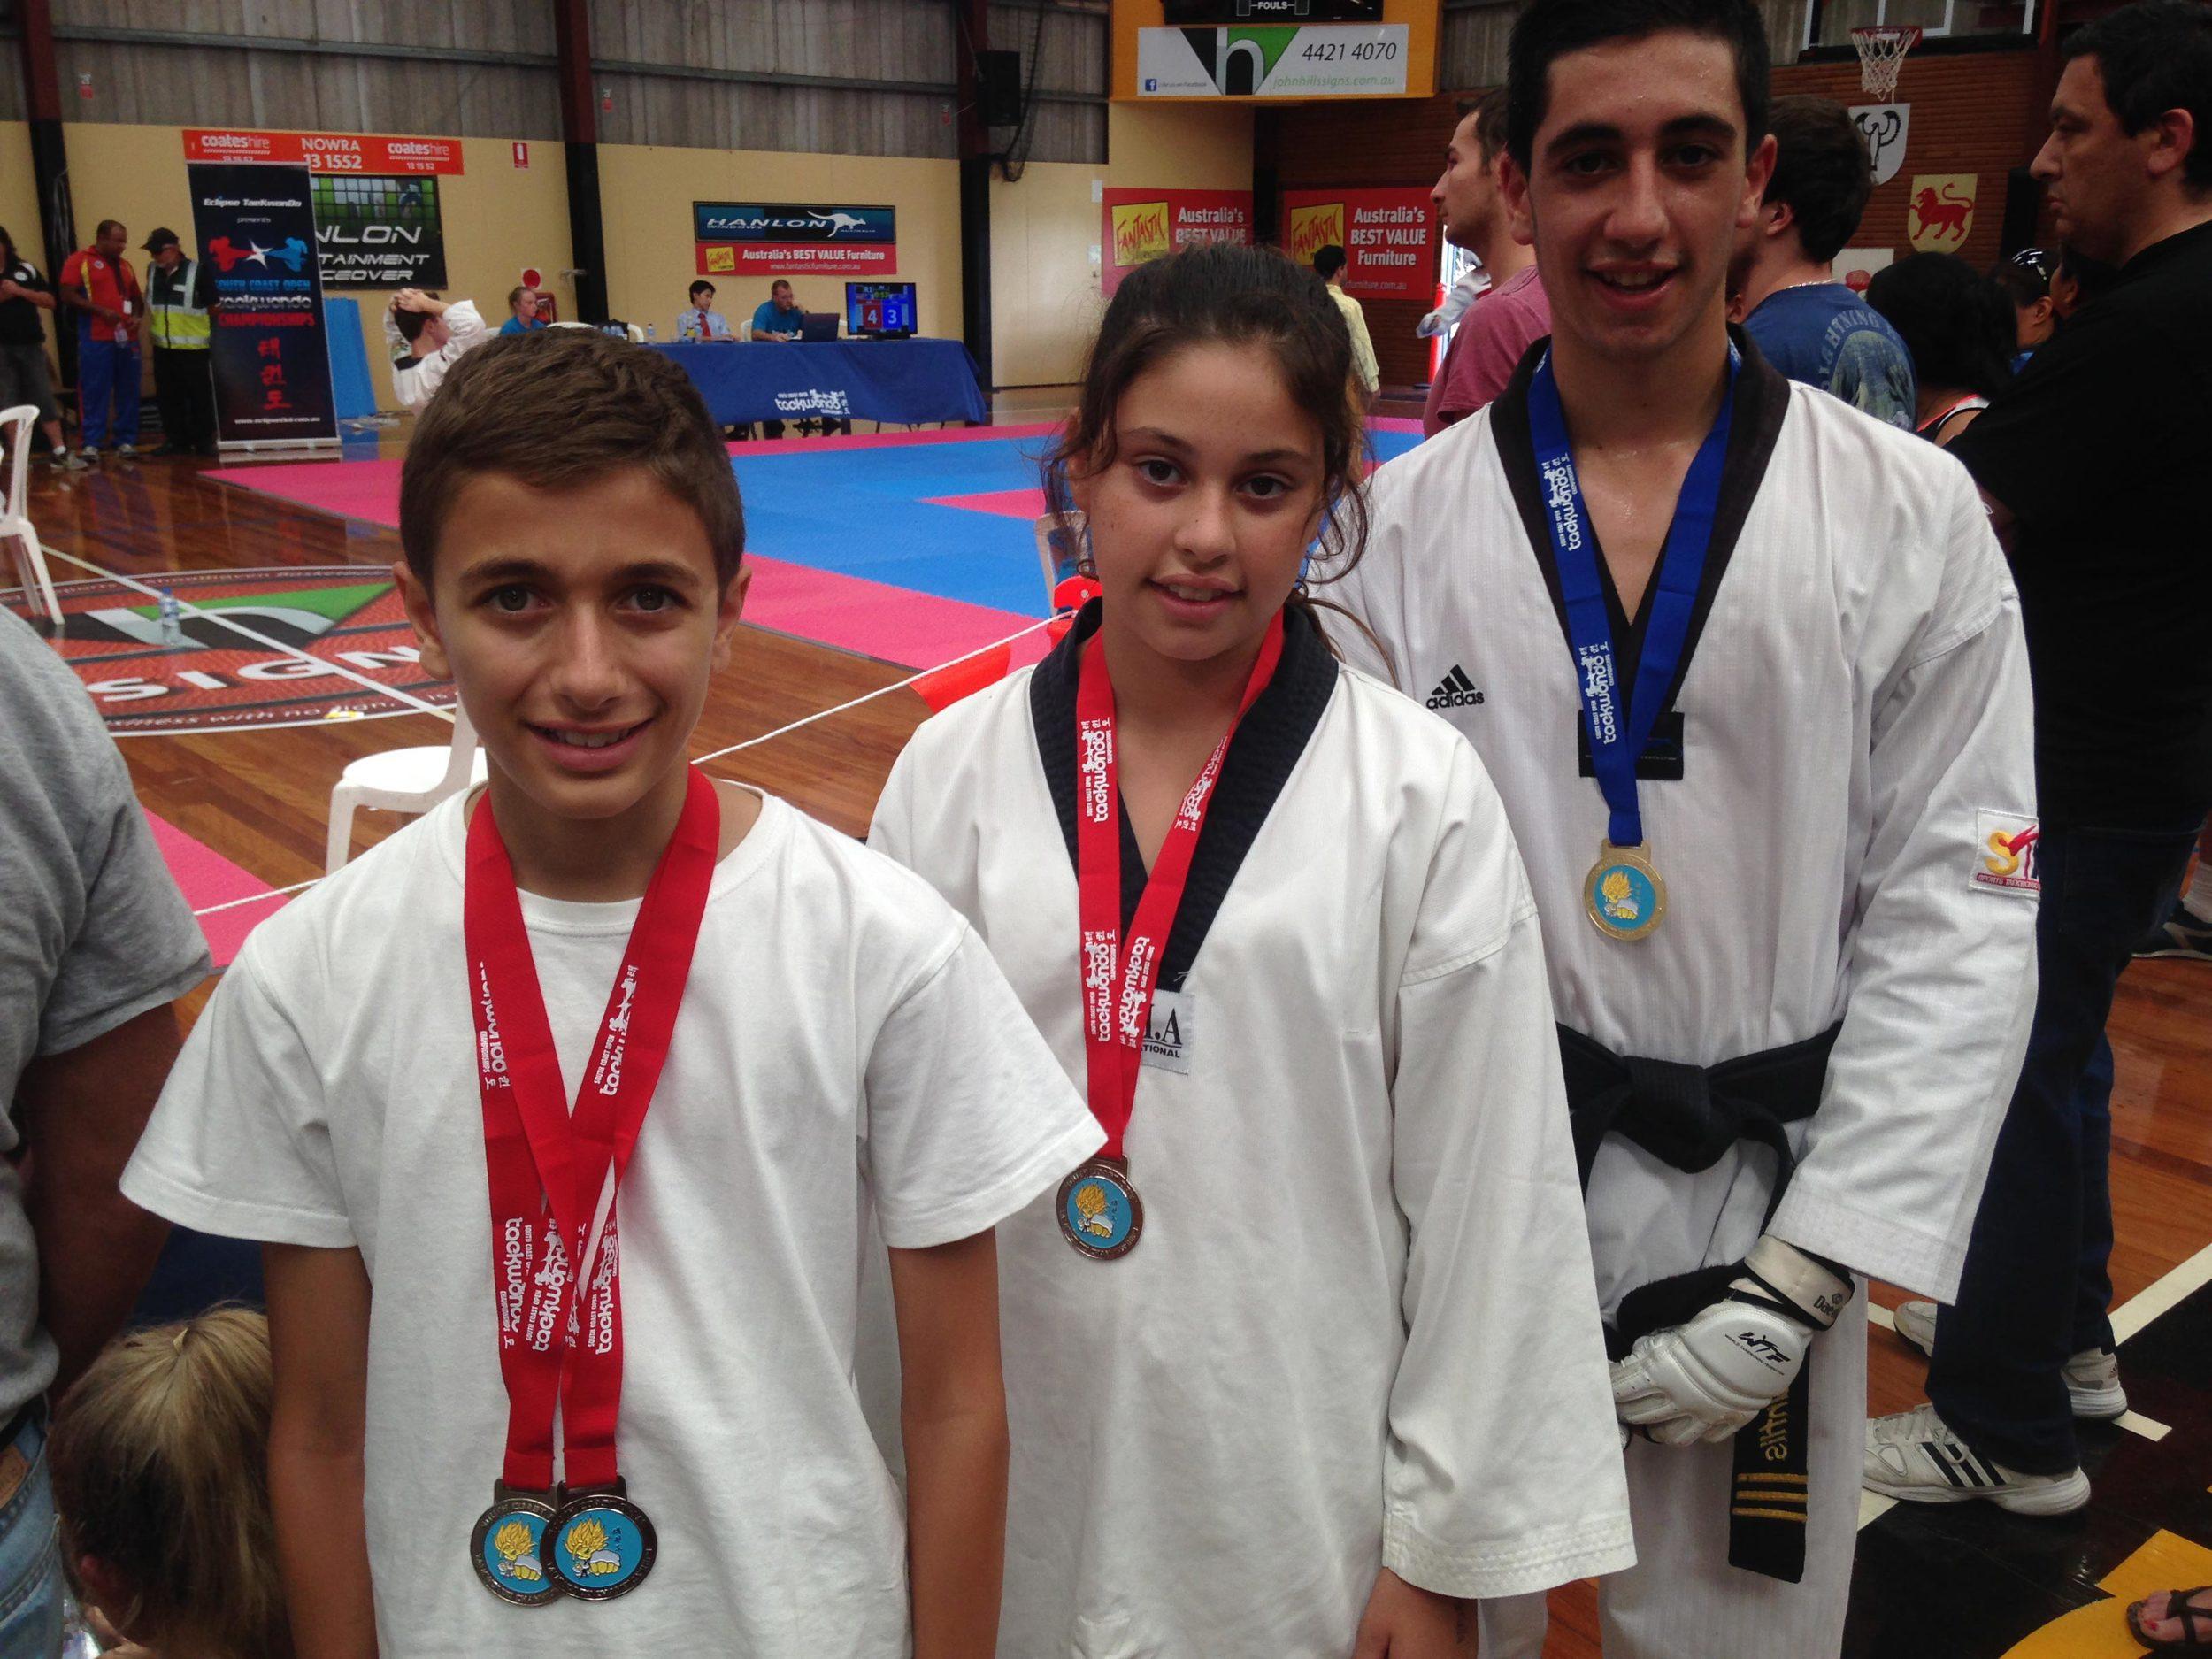 Matthew, Gabriella and Alessandro at the South Coast Championship